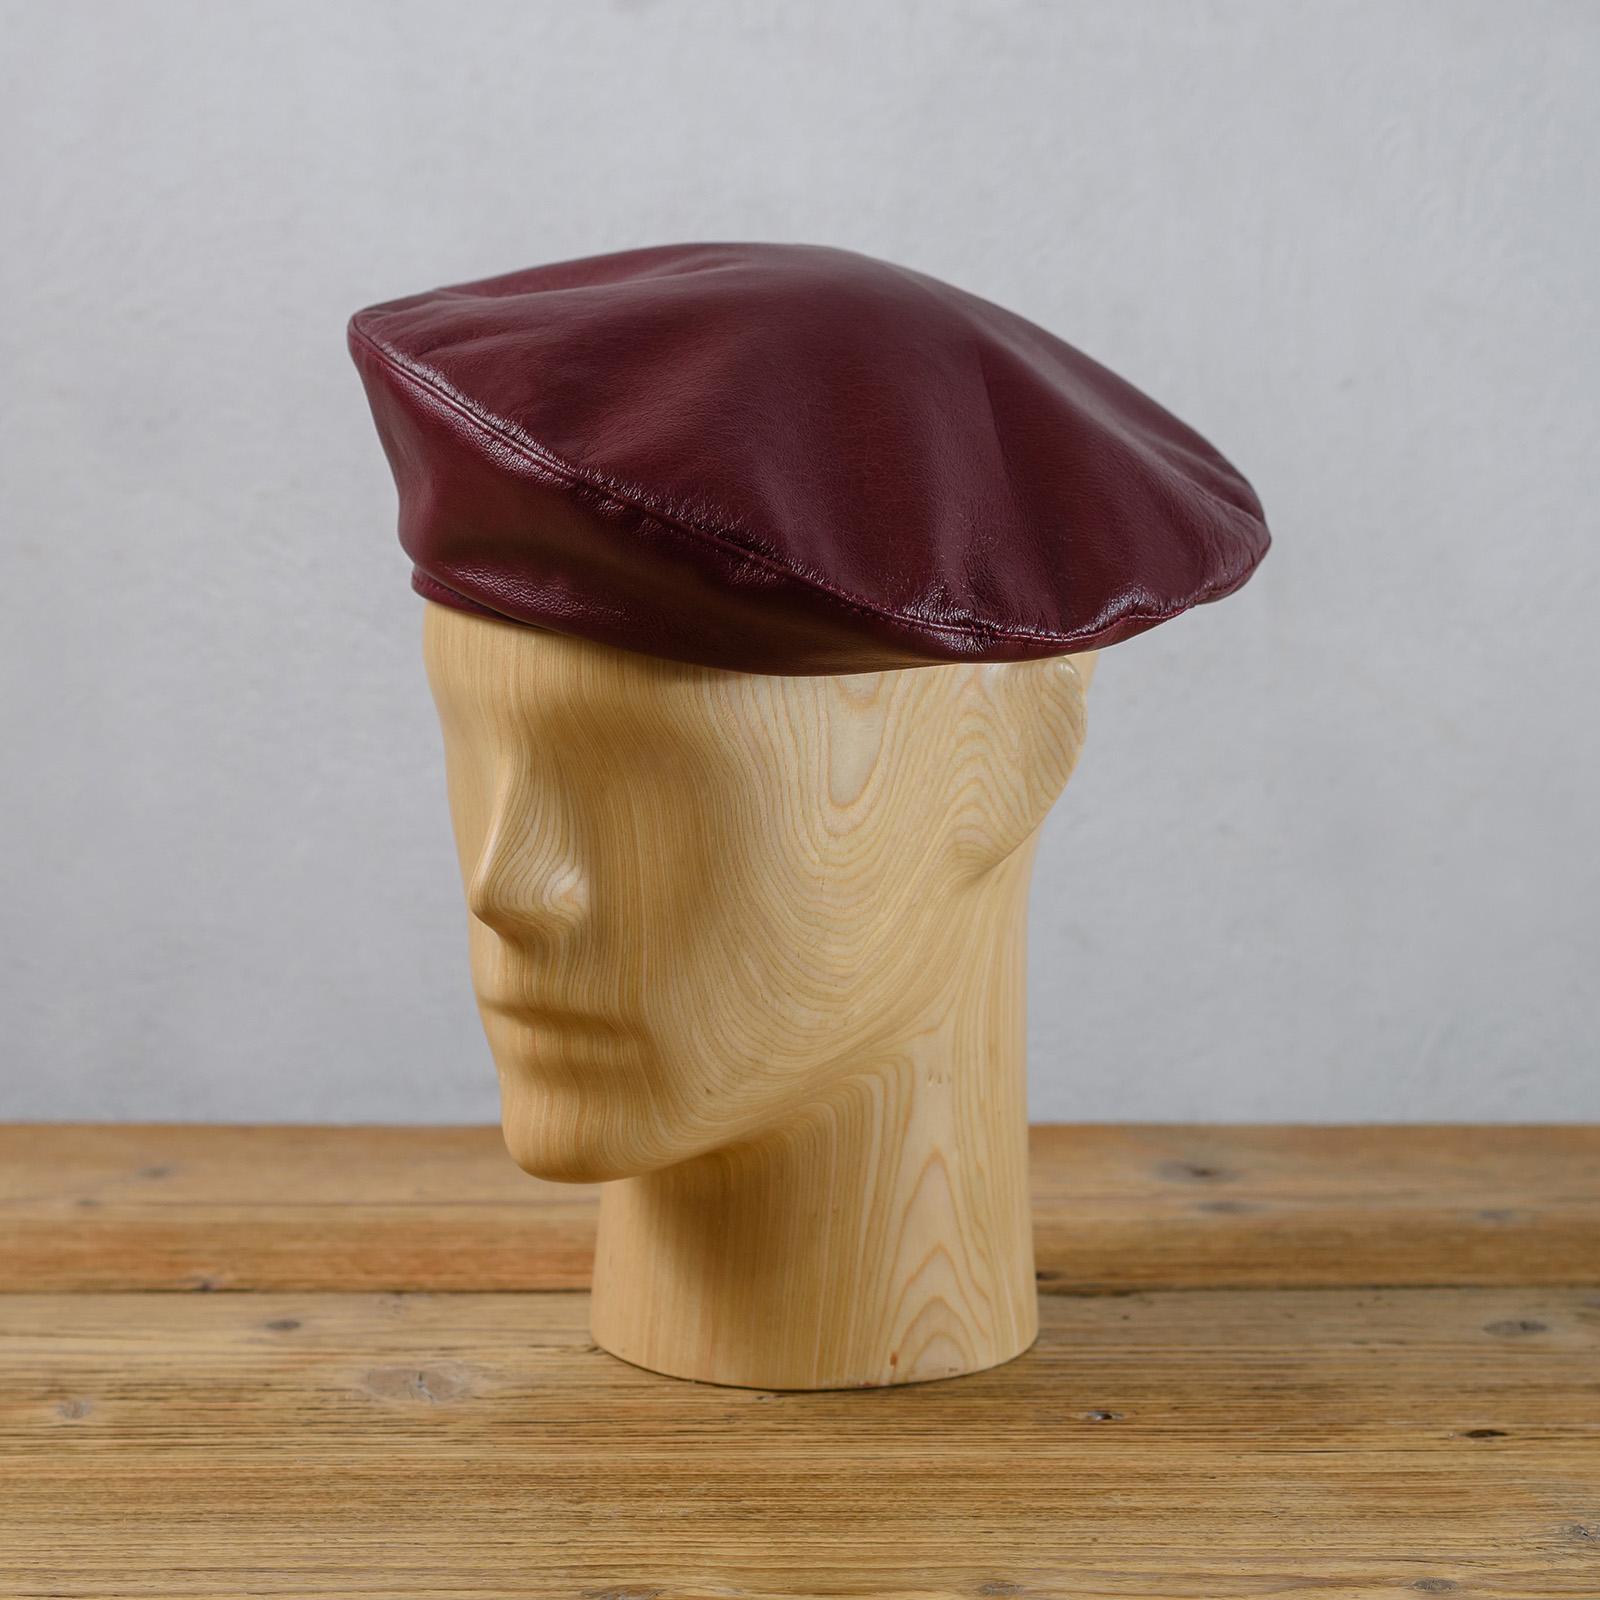 Klasyczny beret szyty z naturalnej skóry - polska pracownia czapek